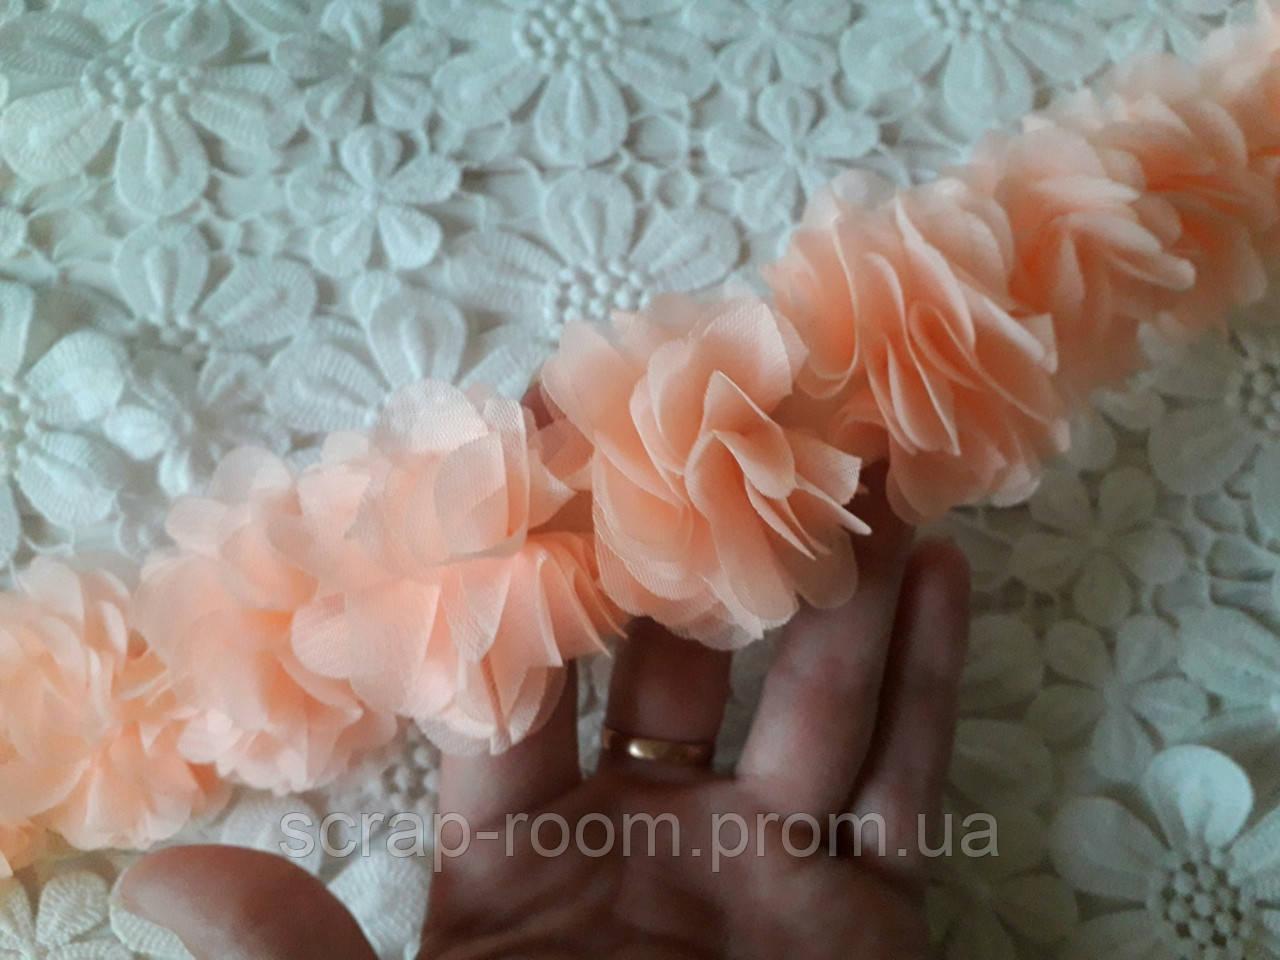 Лента шифоновая персик, шифоновая лента цветы, персиковая шифоновая лента, цена указана за  30 см